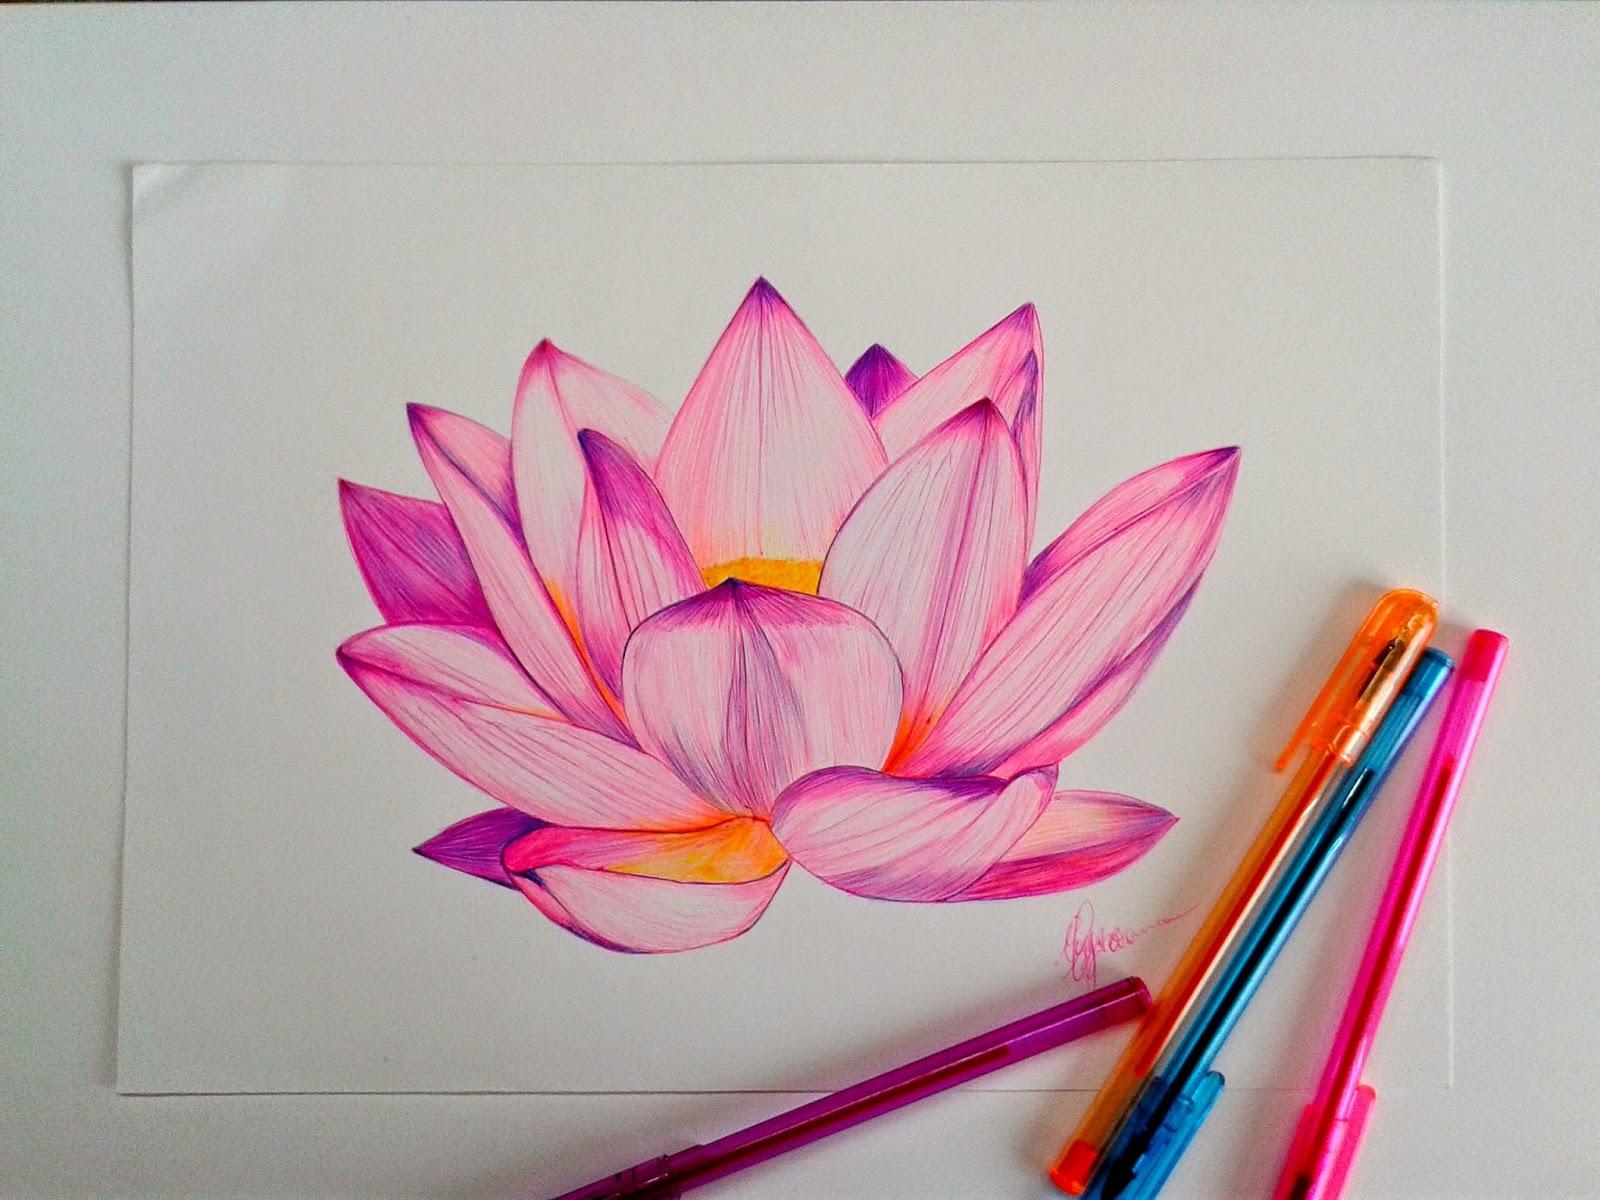 Caggese art design creazioni artistiche disegni a penna for Disegni di fiori a matita